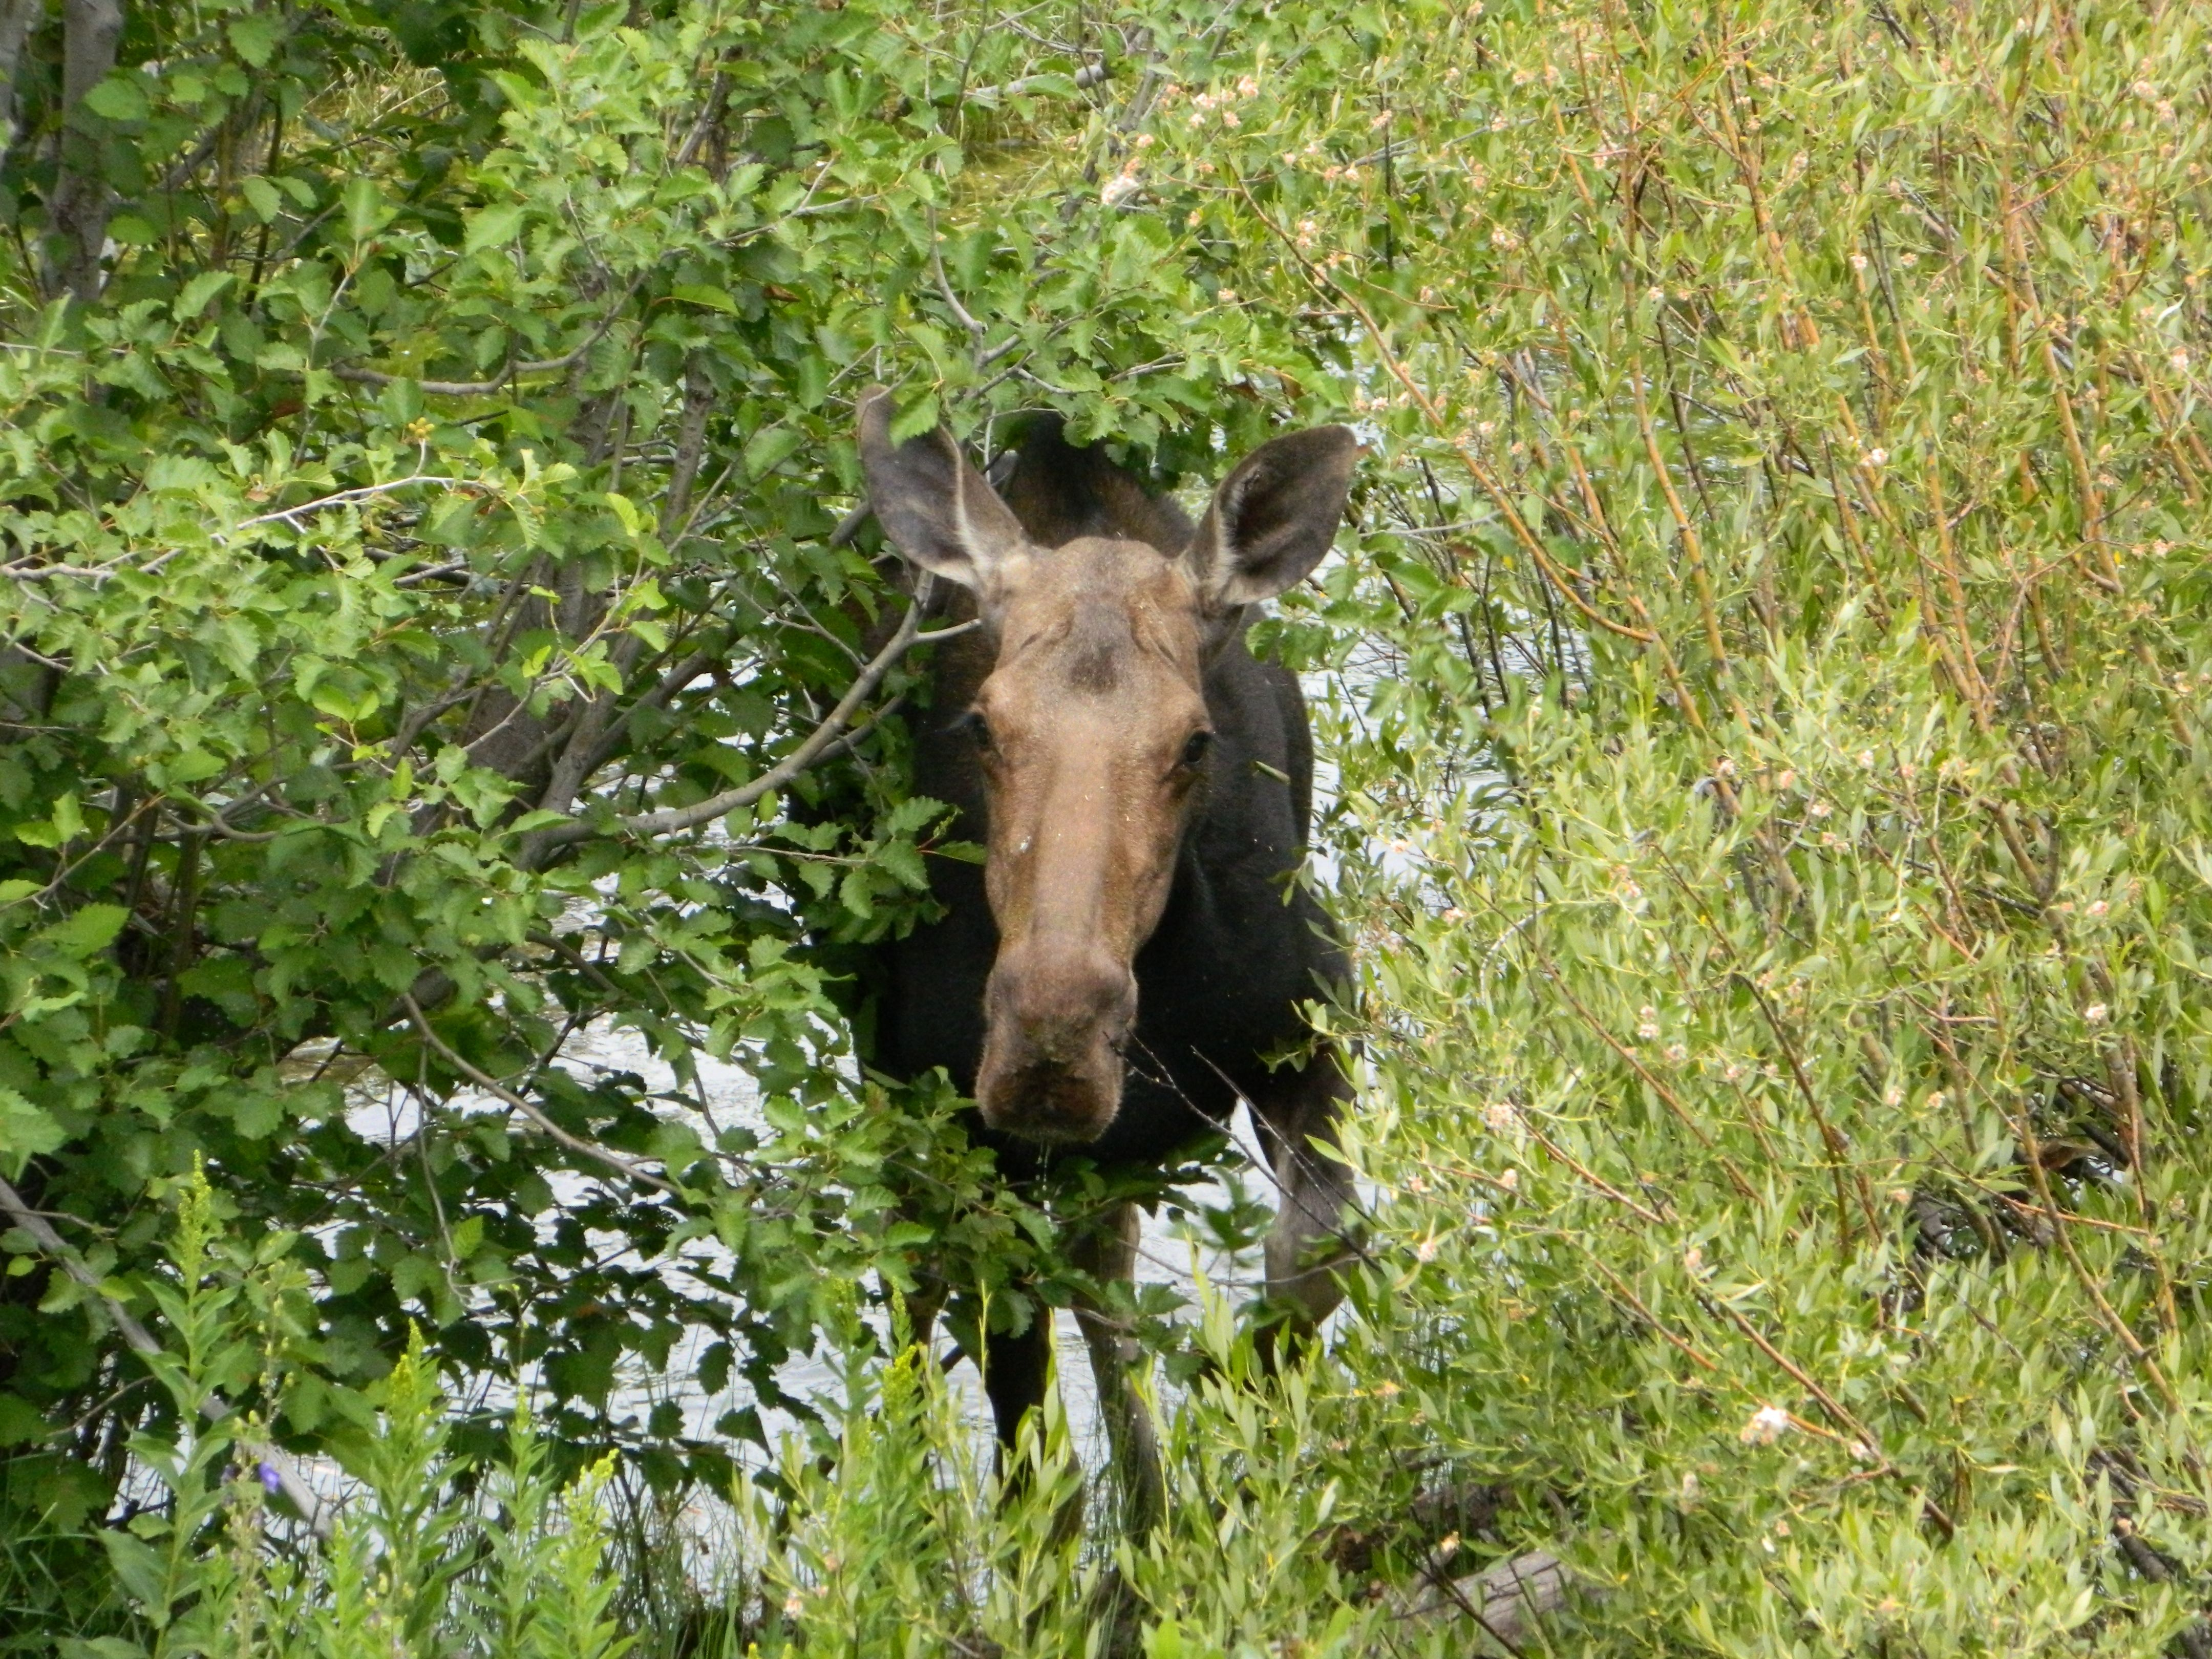 Ahhh the moose! 2011